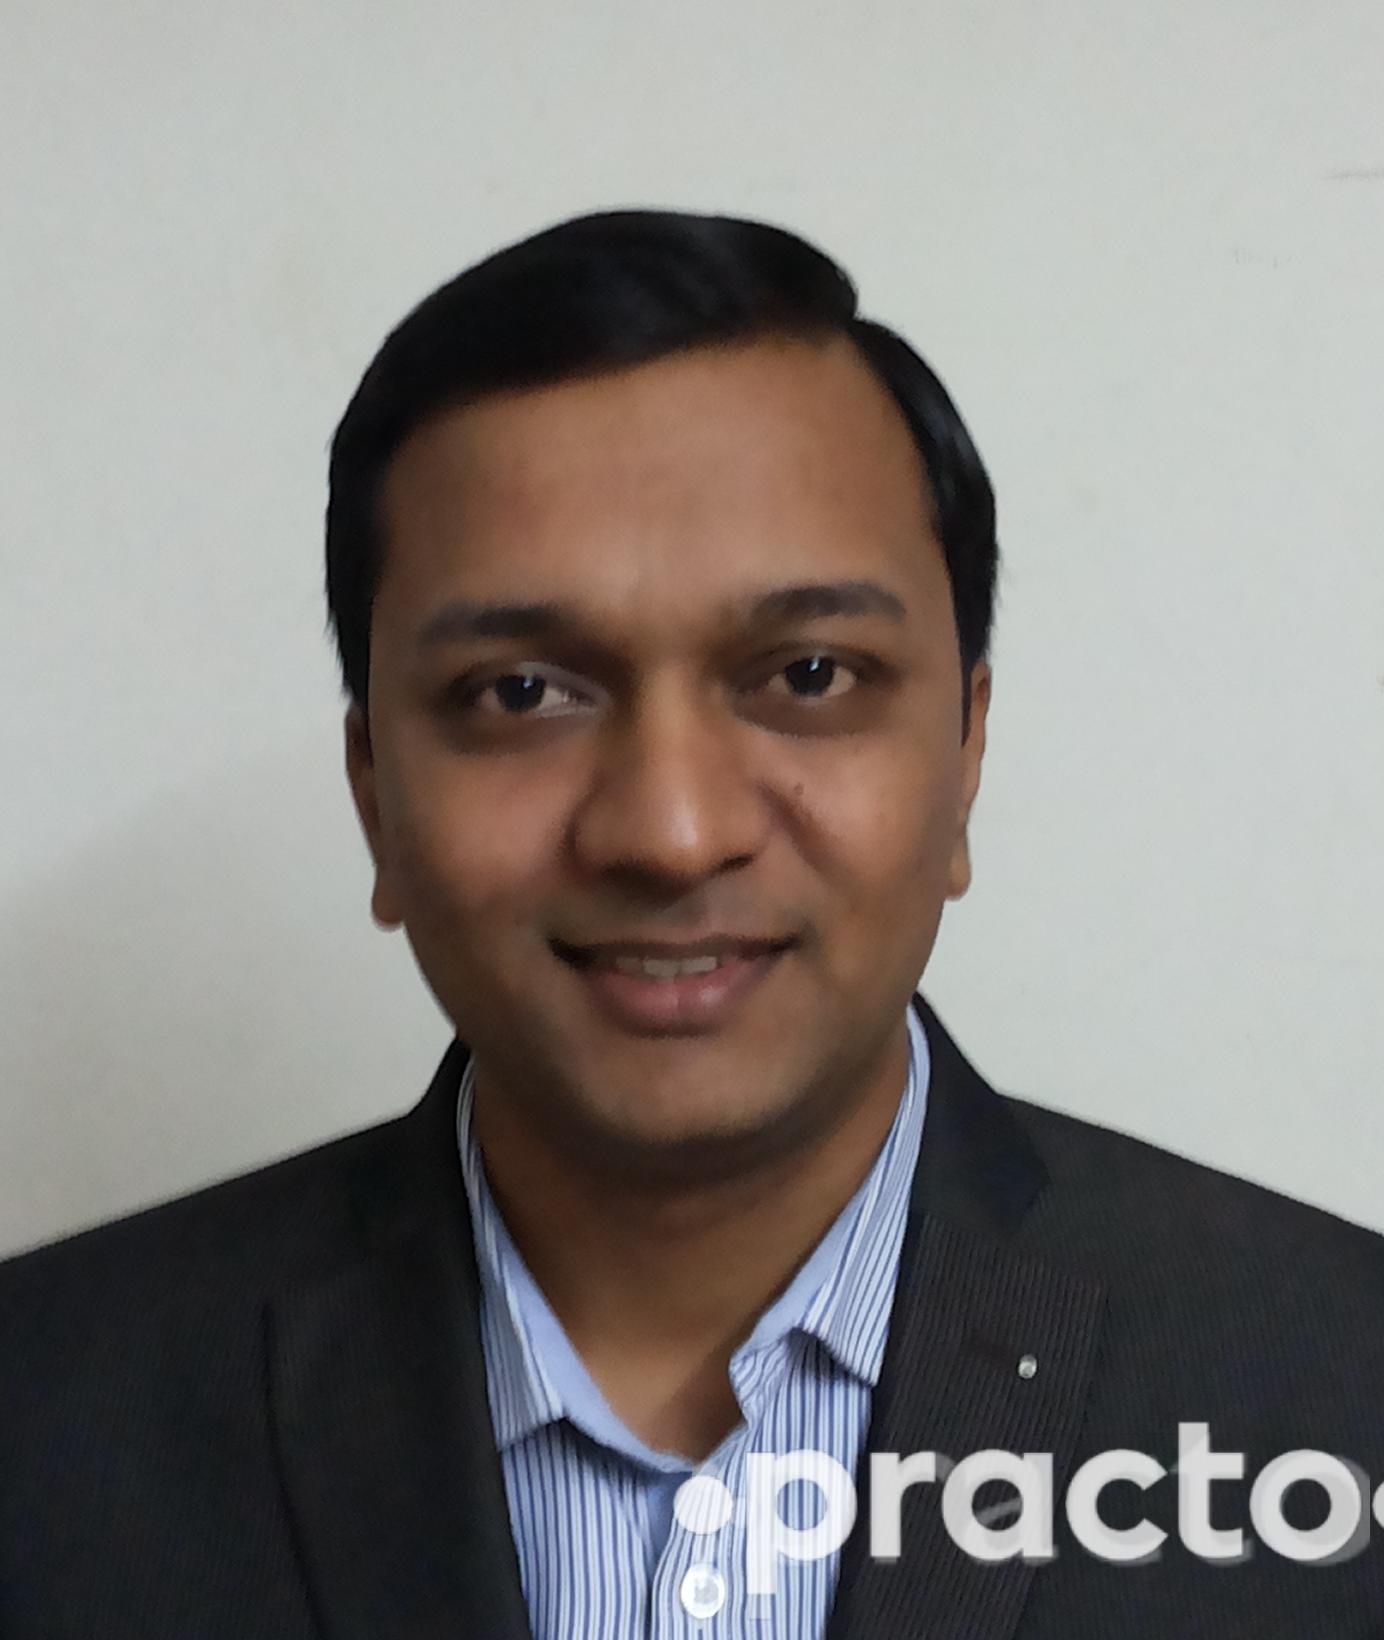 Dr. Bhushan Patil - Plastic Surgeon